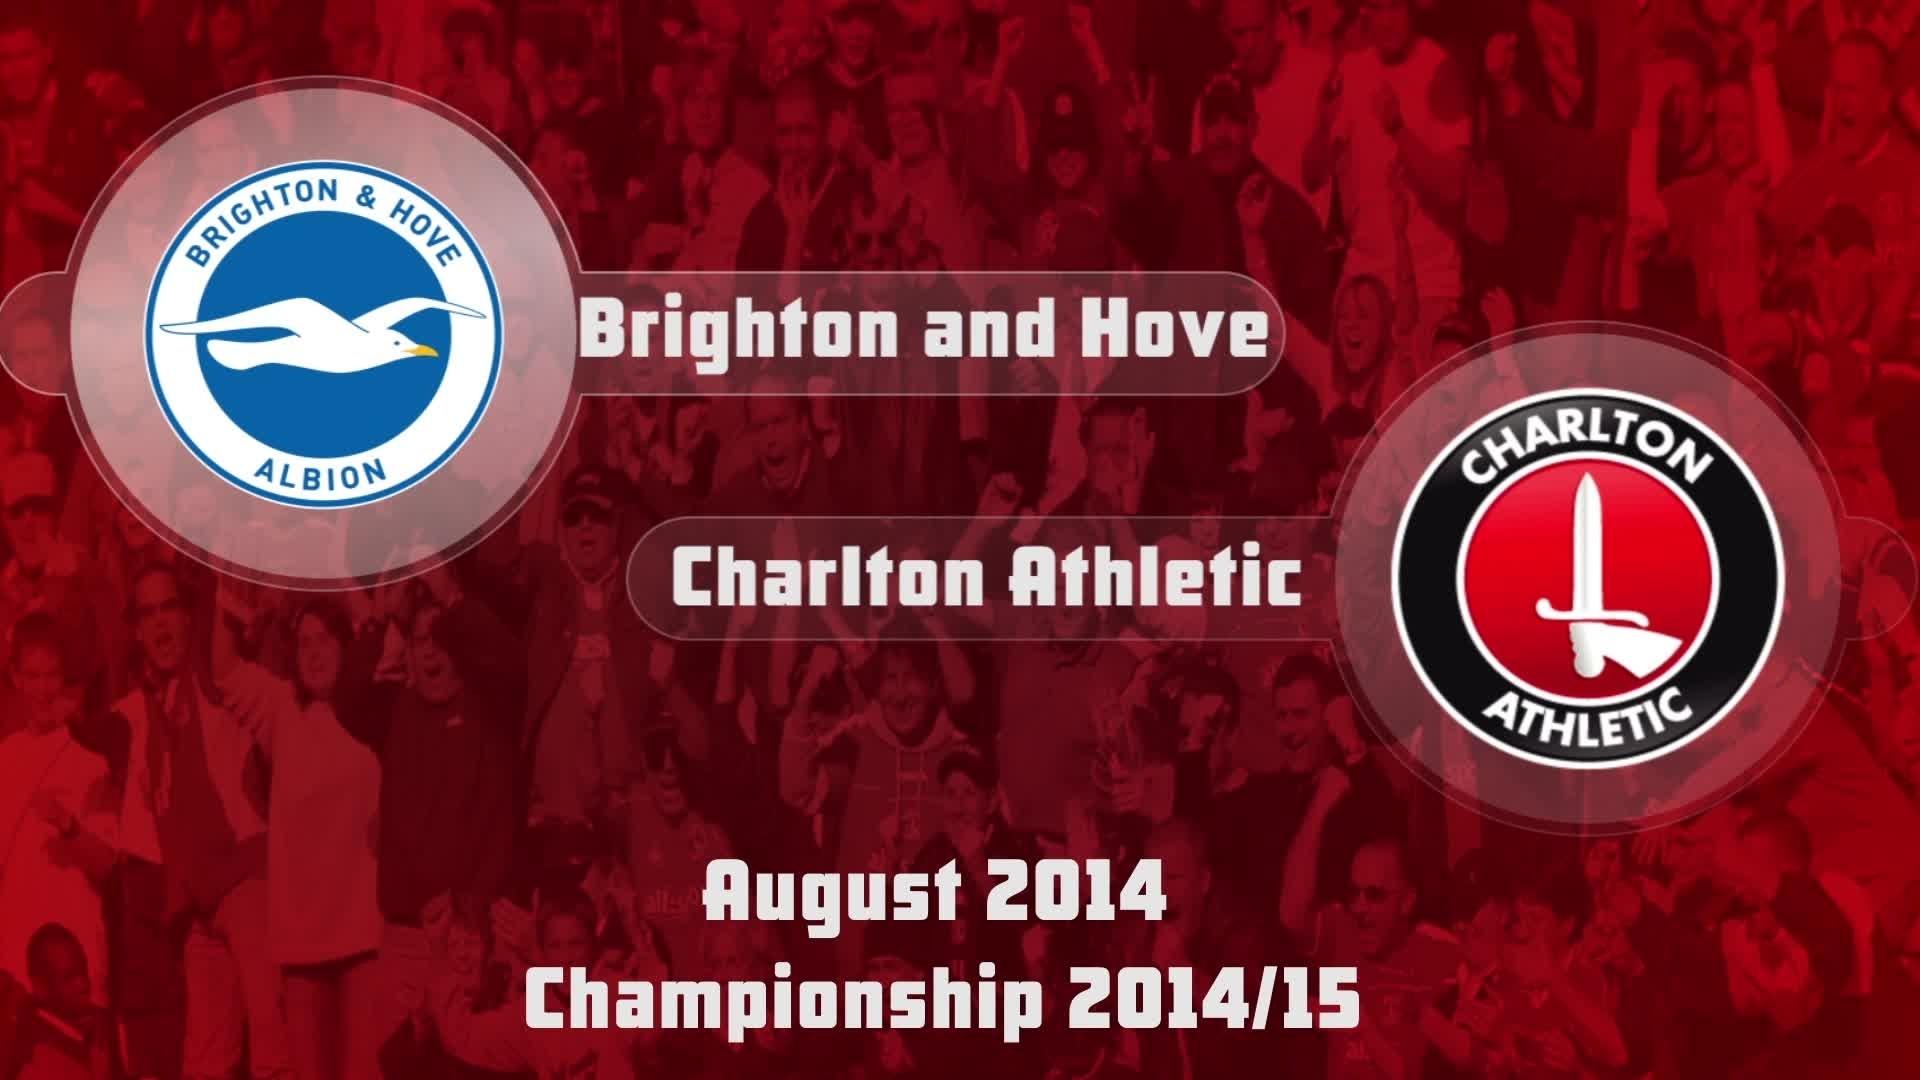 07 HIGHLIGHTS | Brighton and Hove 2 Charlton 2 (Aug 2014)